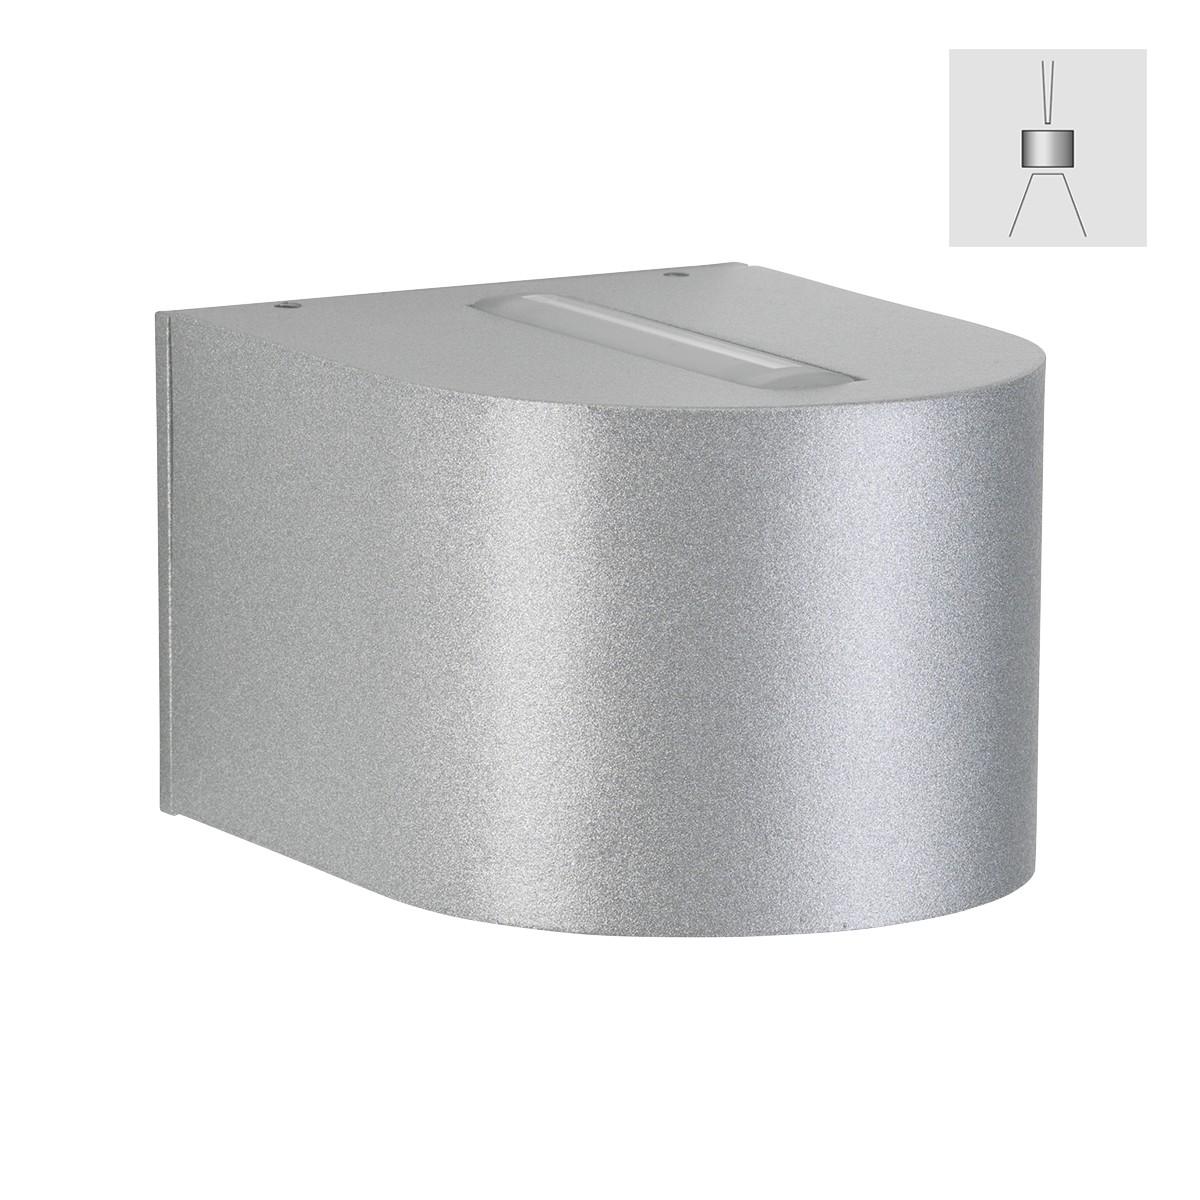 Albert 2339 Wandstrahler, eng/breit, Silber